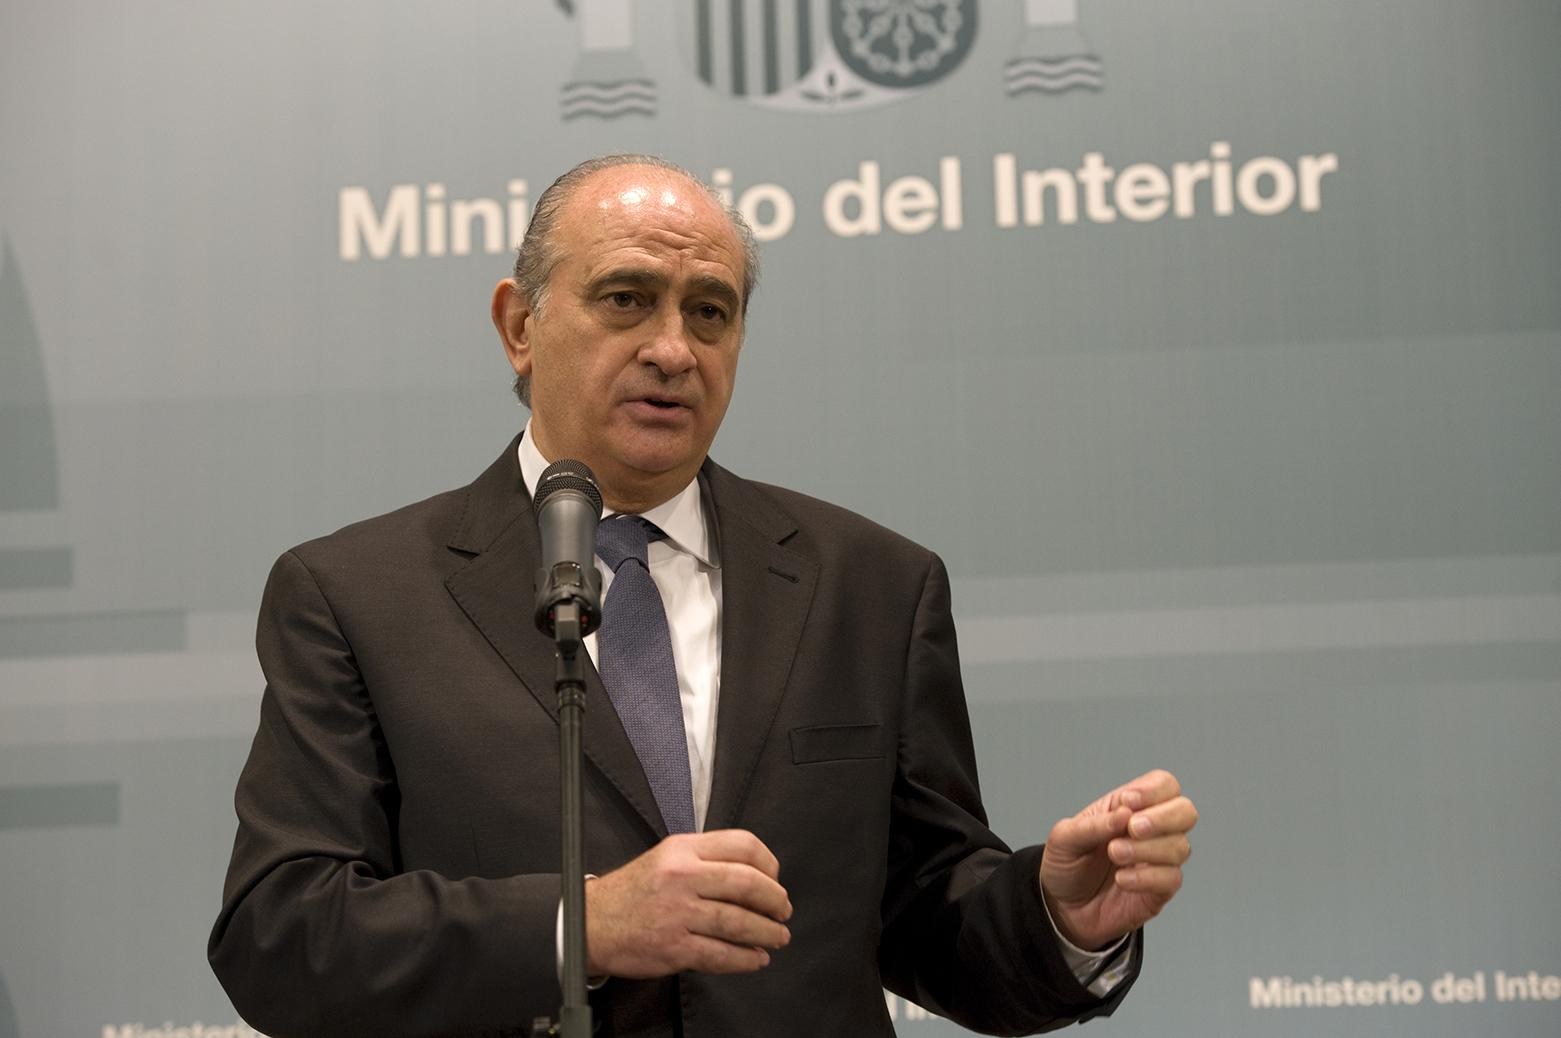 Jorge fern ndez d az ministro del interior en funciones for Ministro del interior quien es